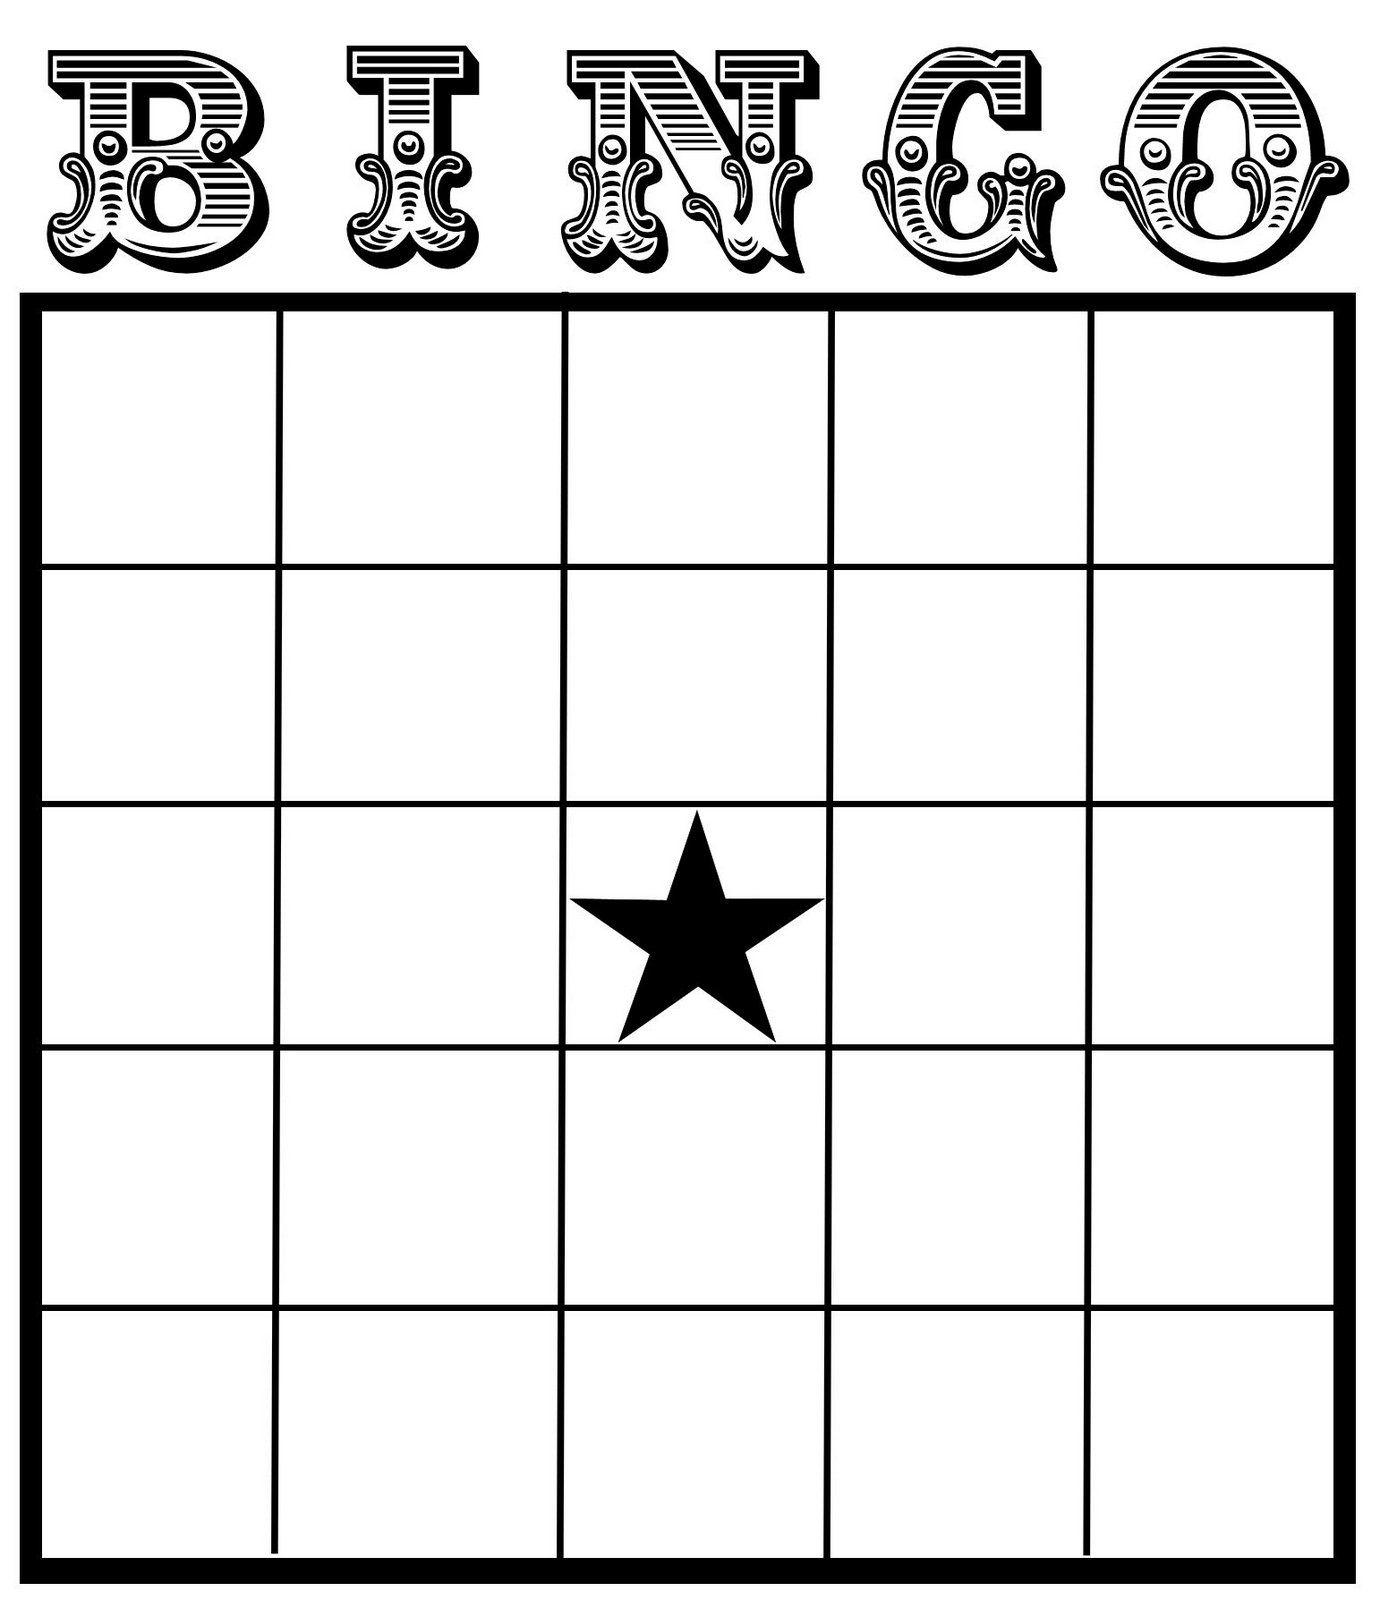 Bingo Card Printables To Share